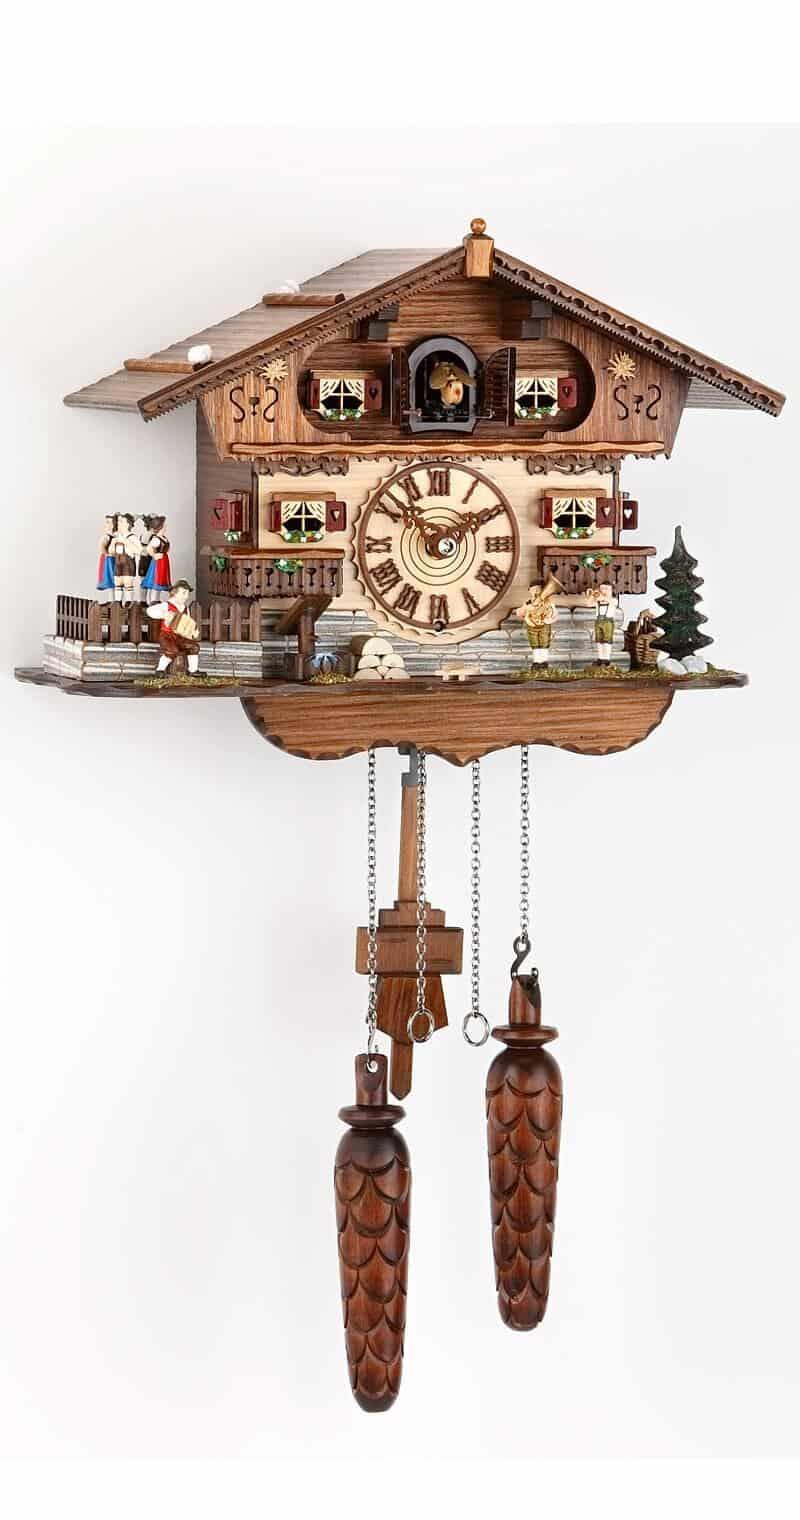 cuckoo clock with dancers